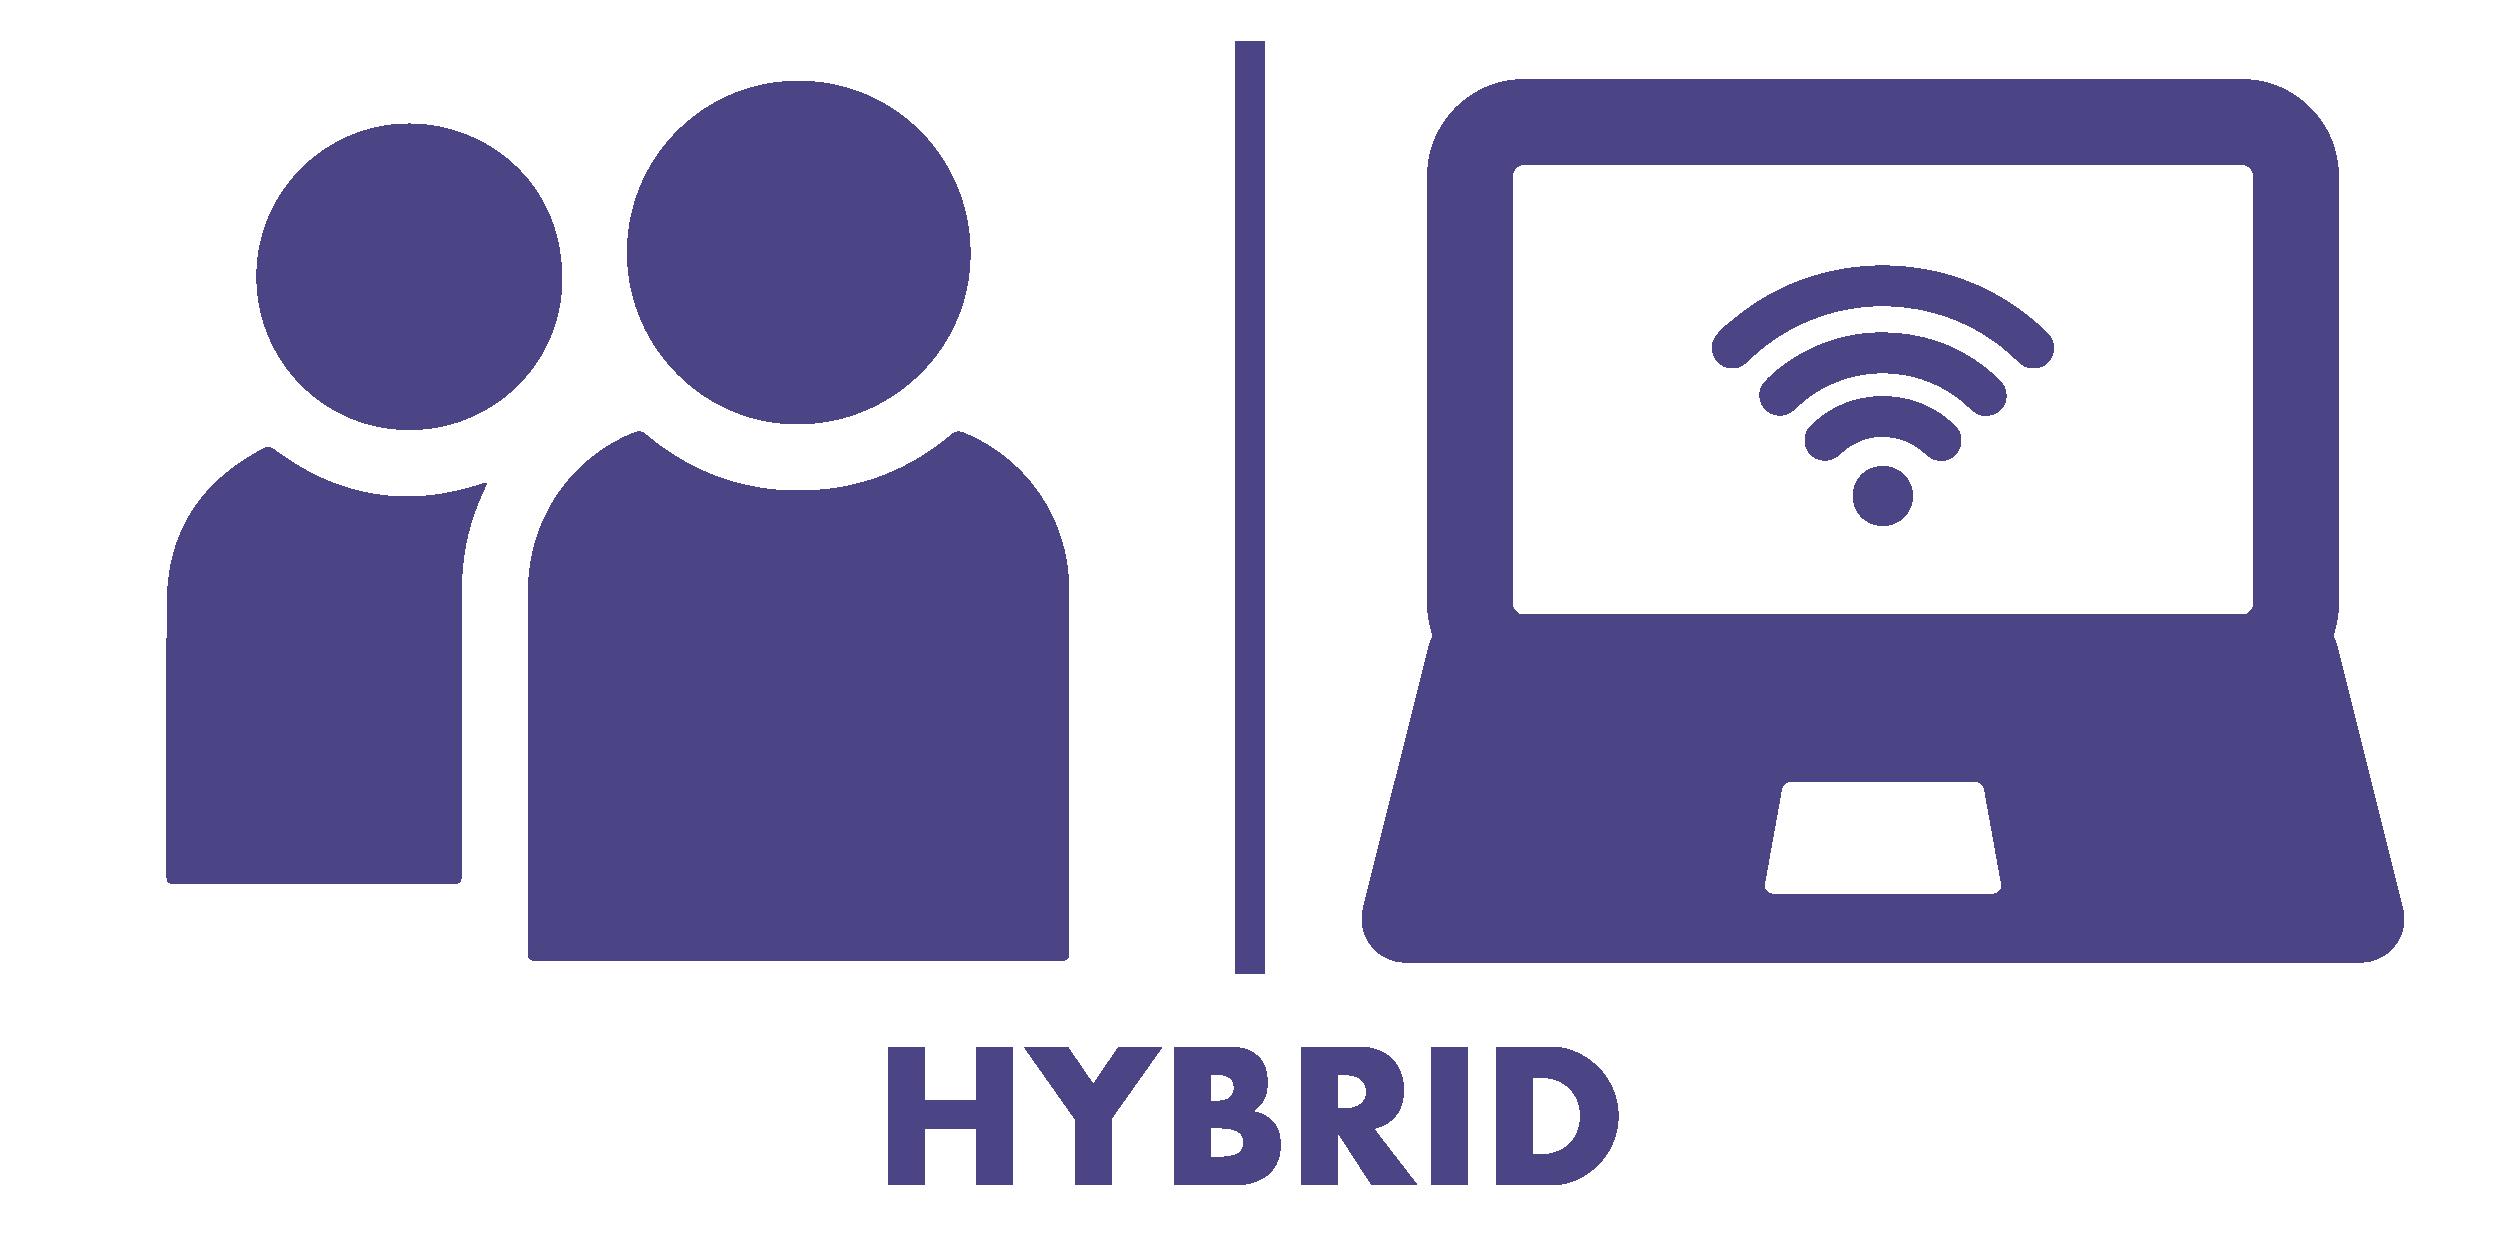 hybrid icon - transparent